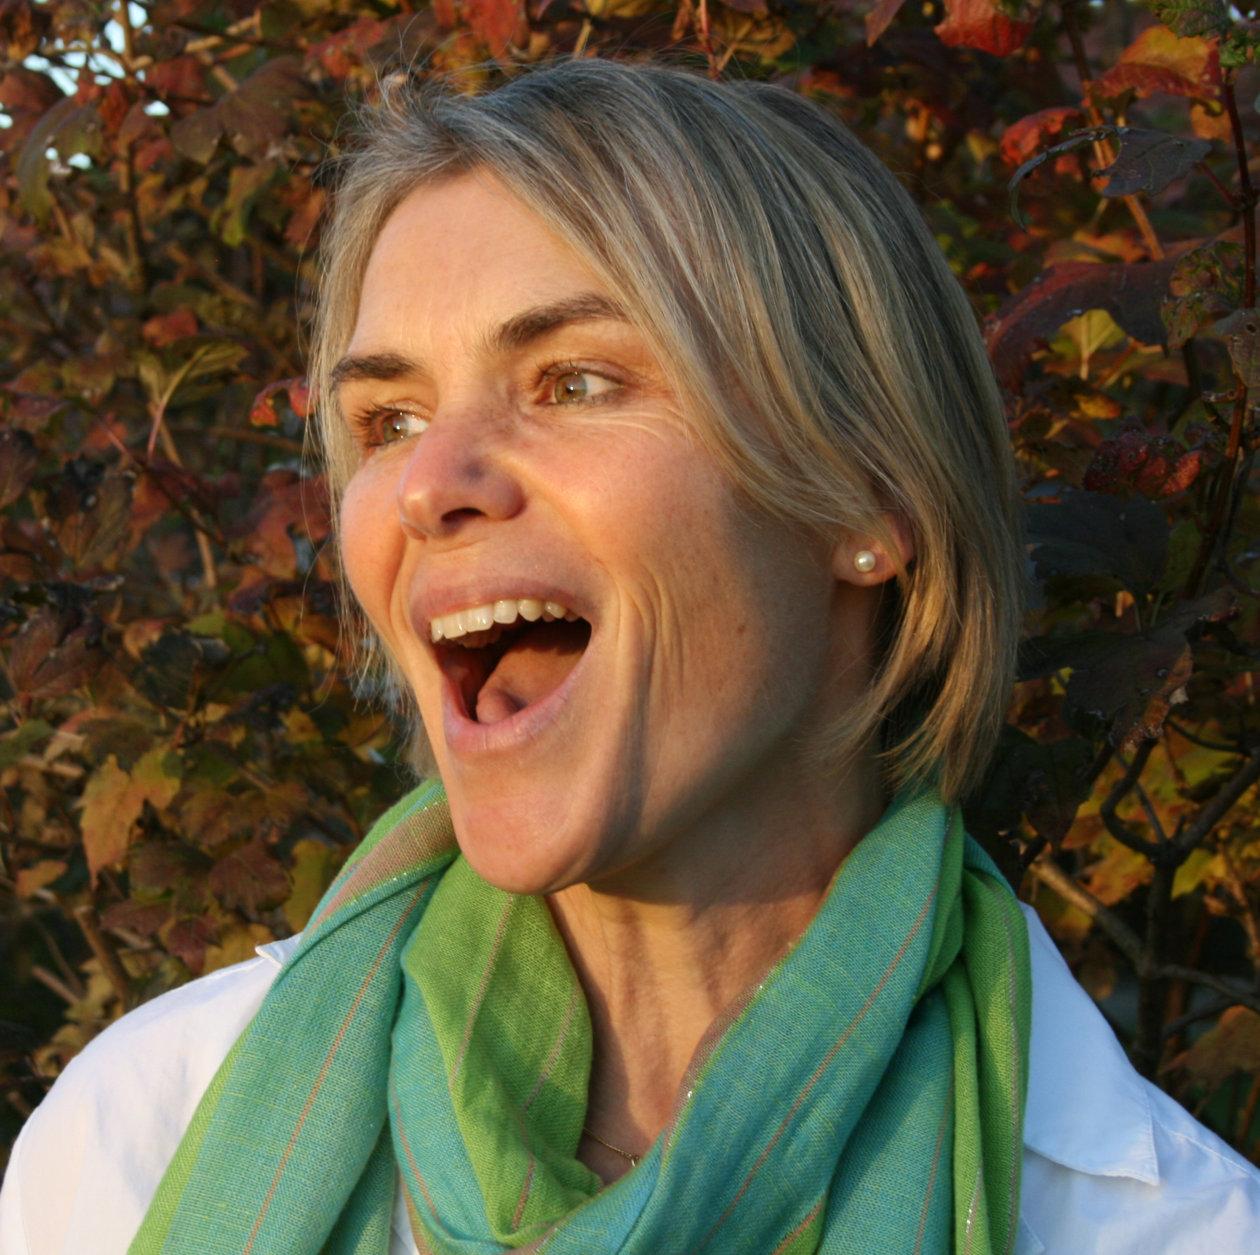 Singen stärkt das Immunsystem